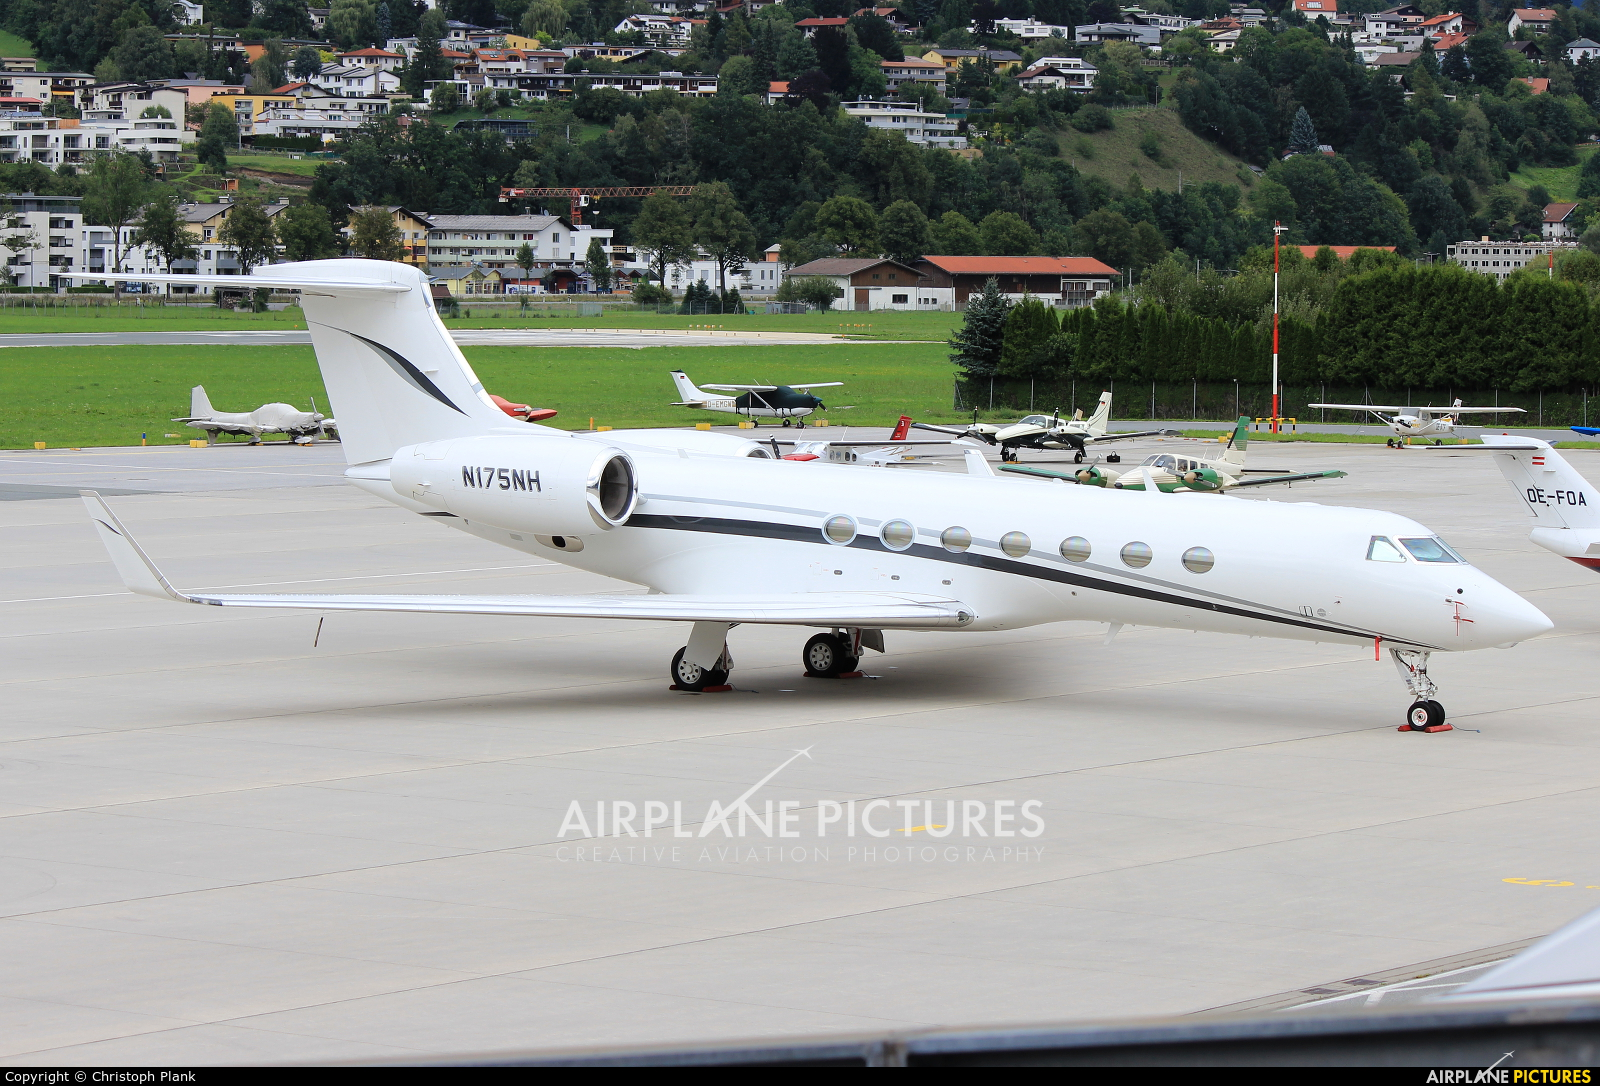 Avpro Inc. N175NH aircraft at Innsbruck